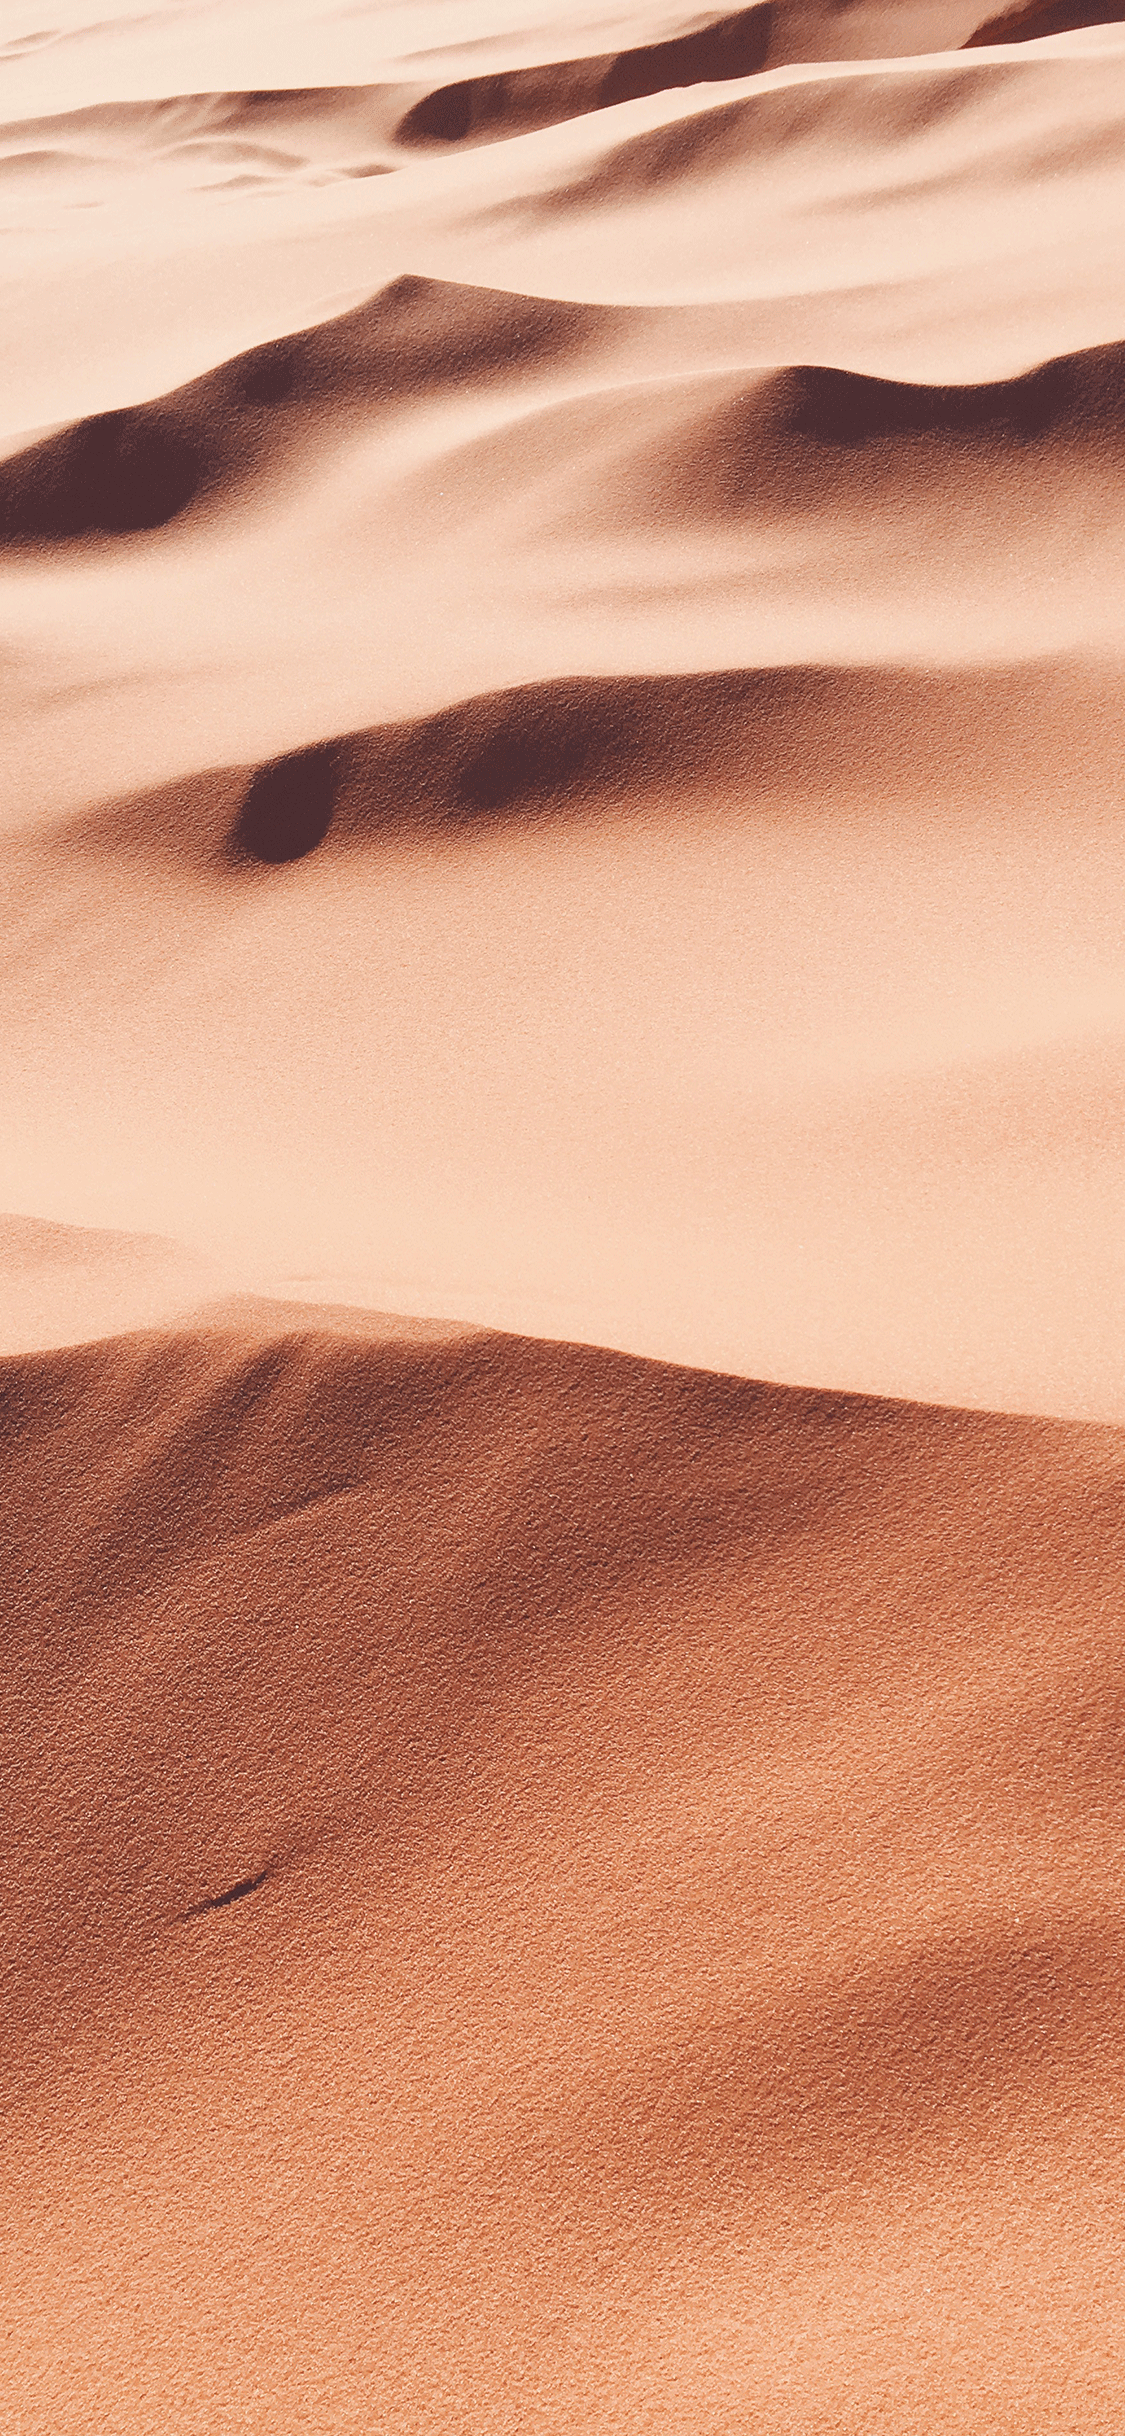 iPhone wallpaper desert kanab Desert